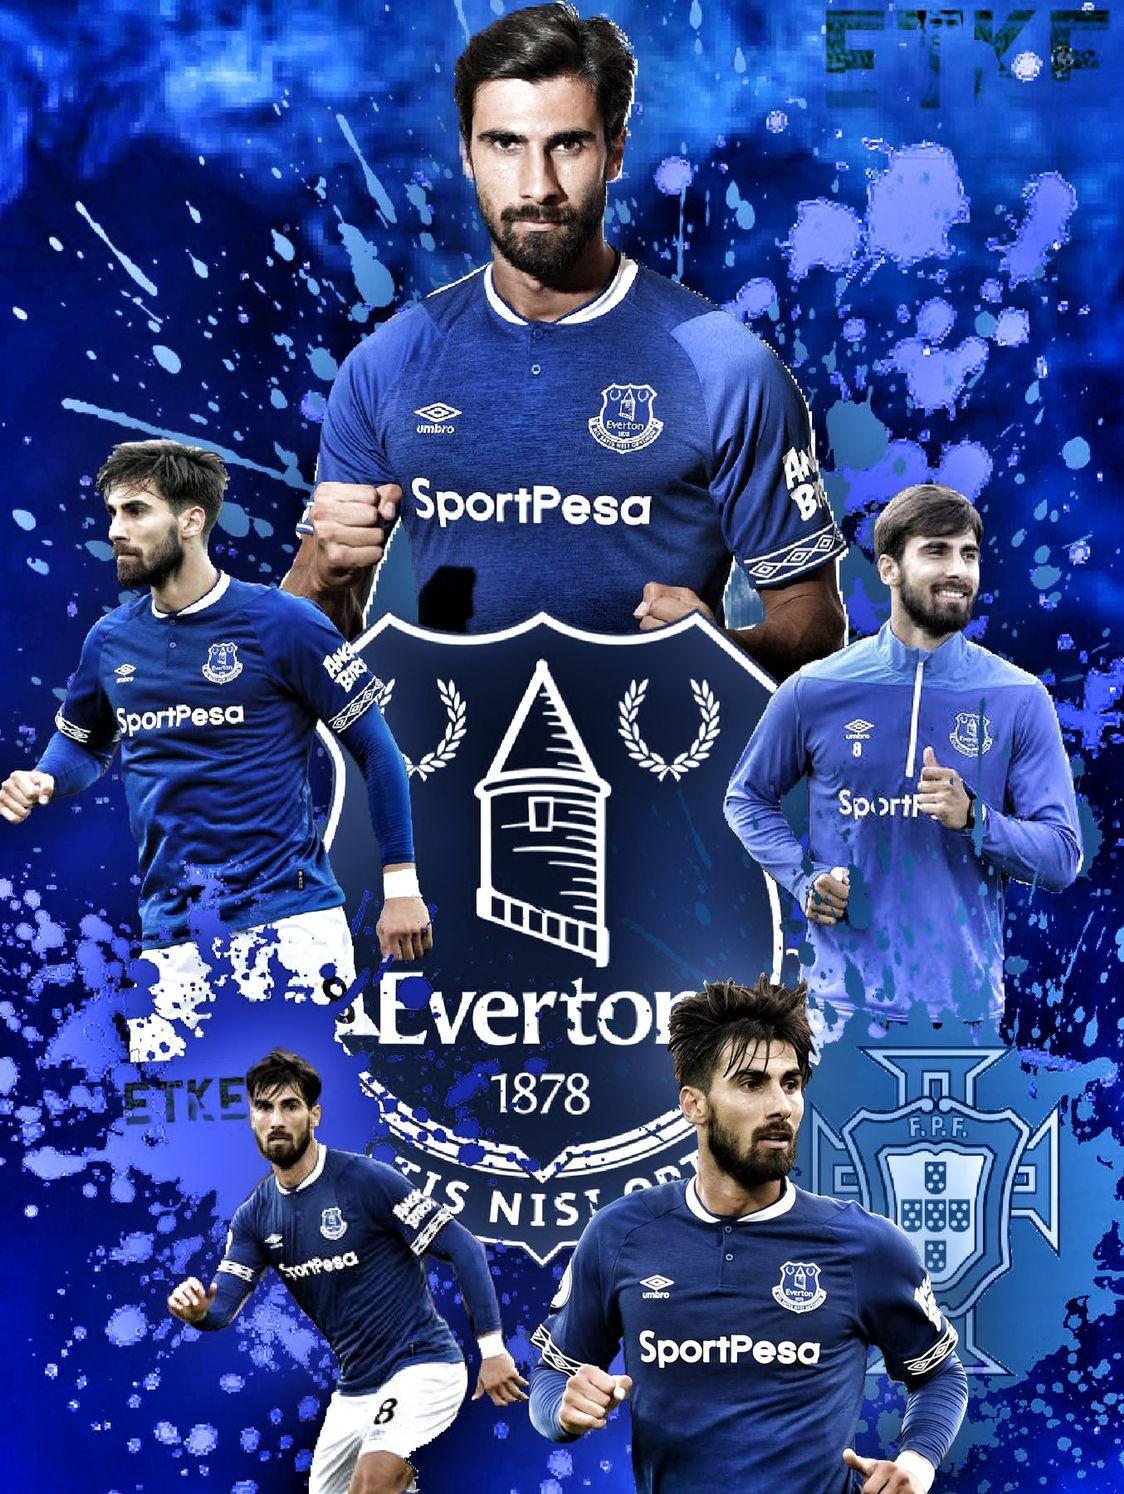 Andre Gomes Everton Etke Everton Football Club Soccer Images Everton